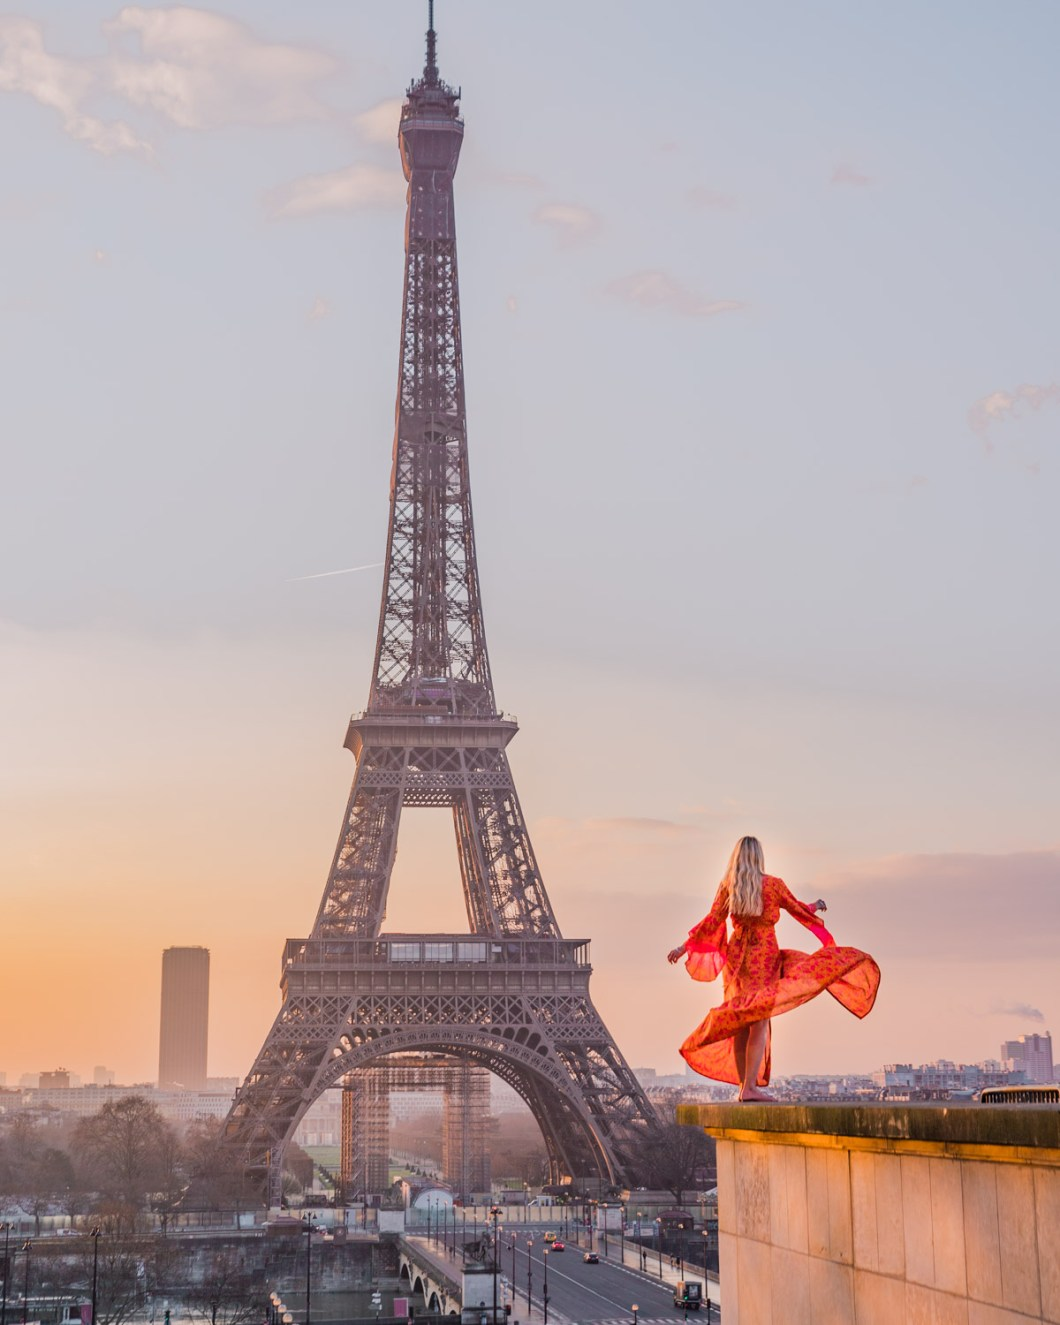 Esplanade du Trocadéro with the Eiffel Tower